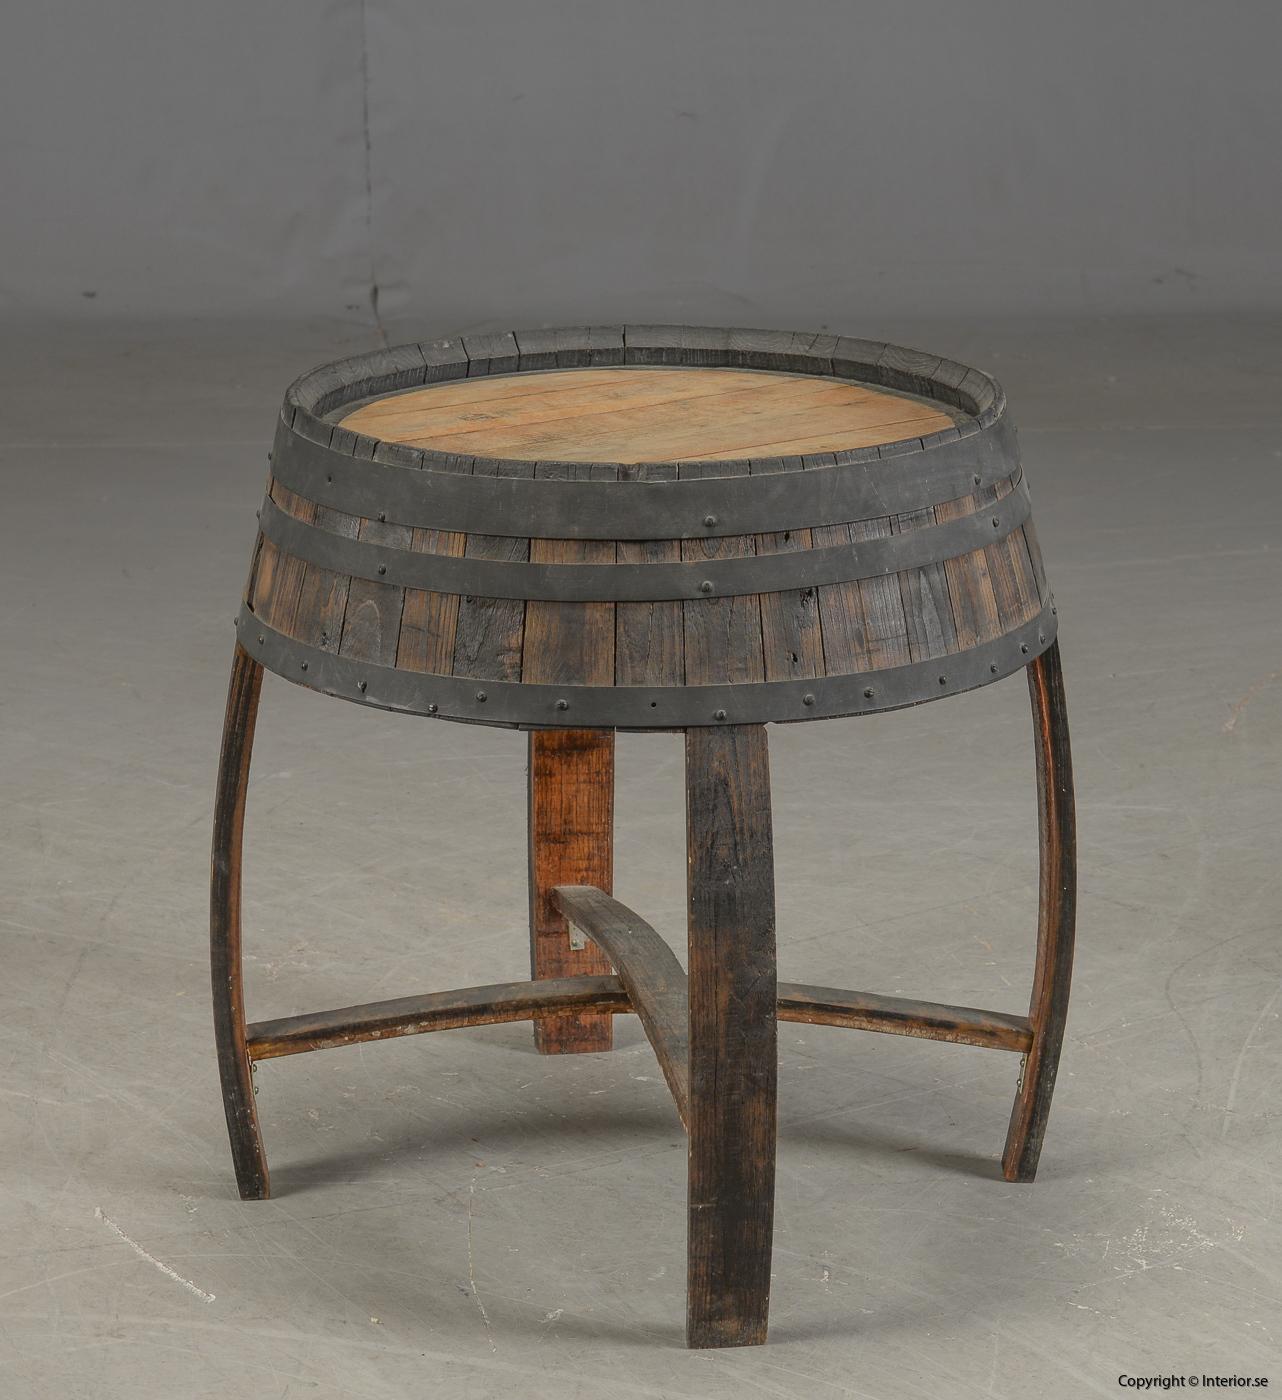 Möbler av vintunnor  wine barrels Meubels gemaakt van wijntunnels Möbel aus Weintunneln, sittpallar & bord 2